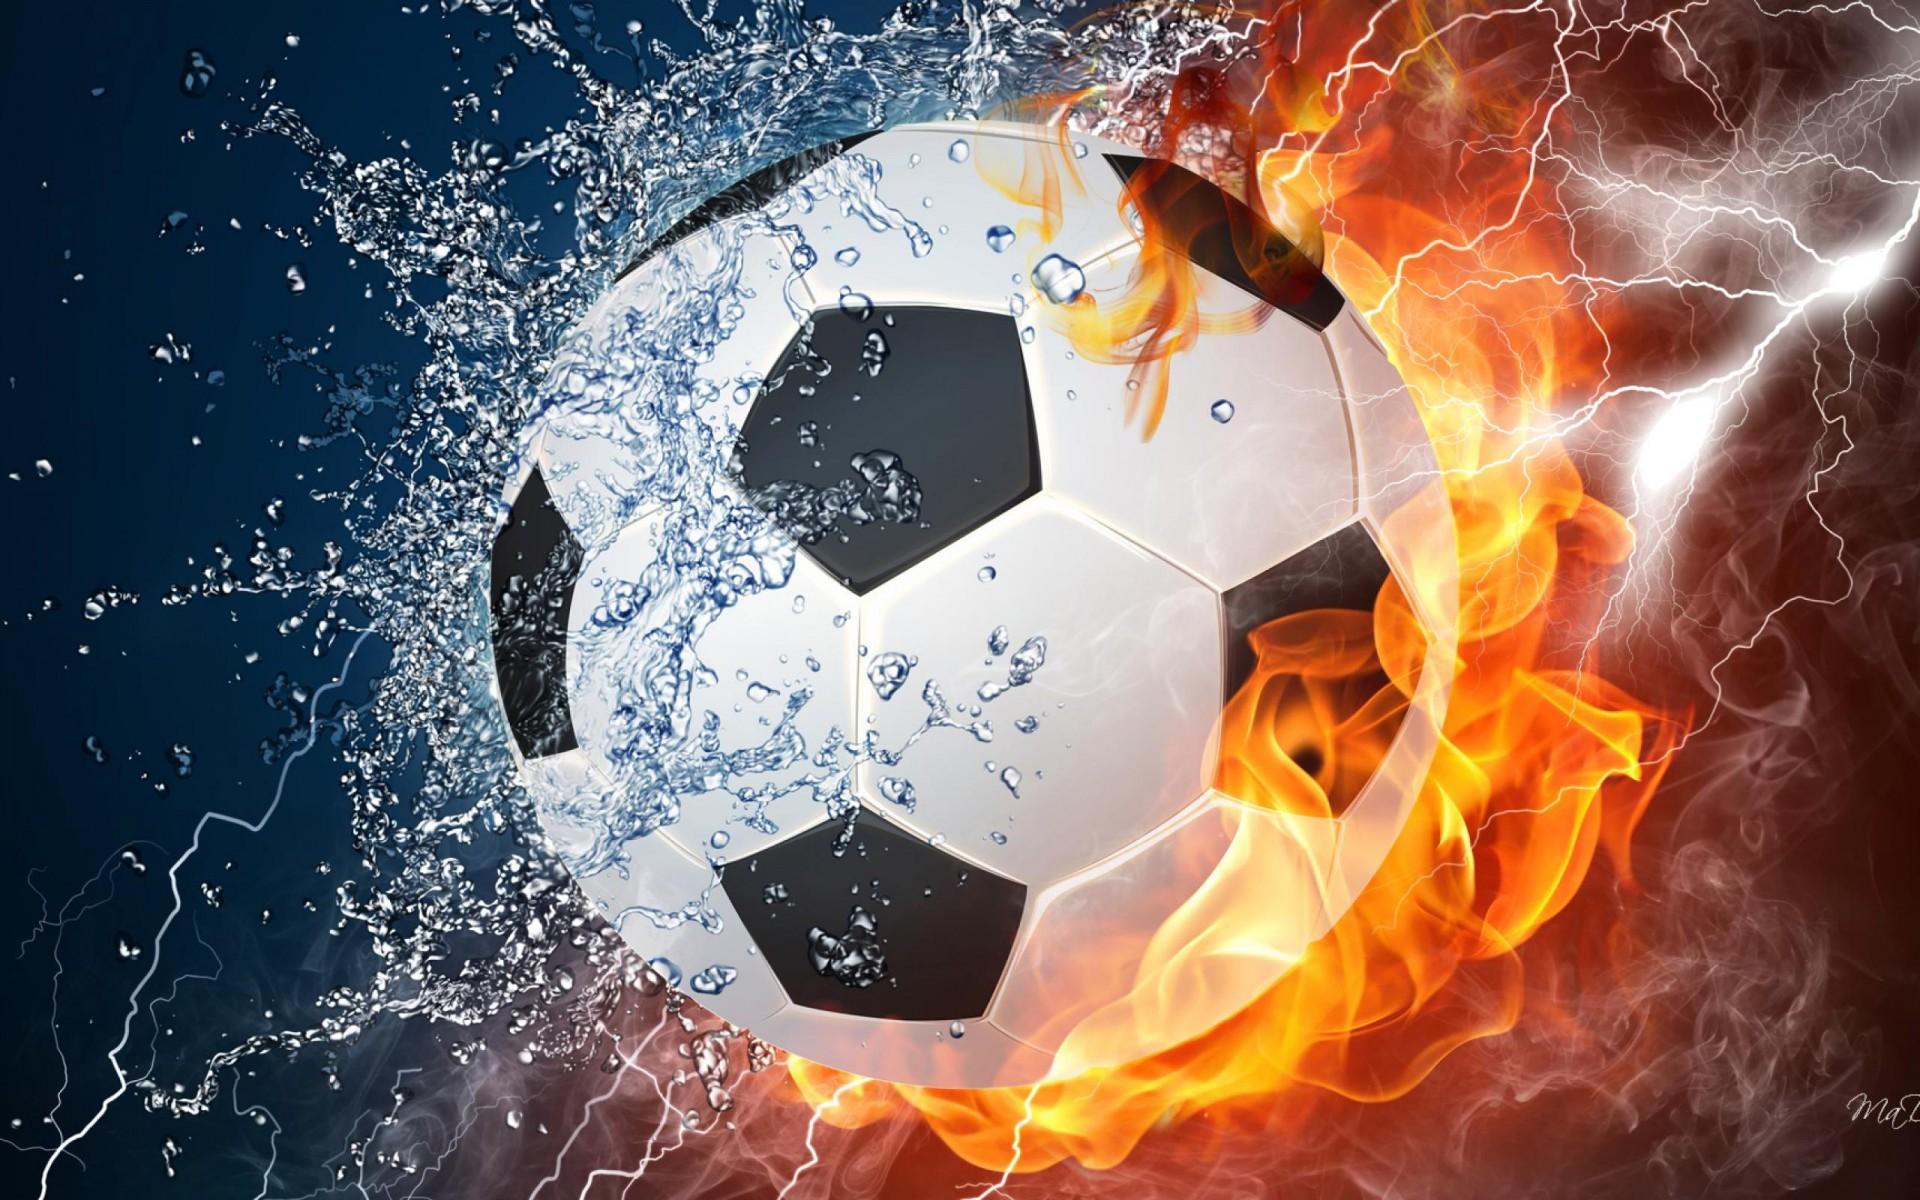 Cool soccer balls on fire